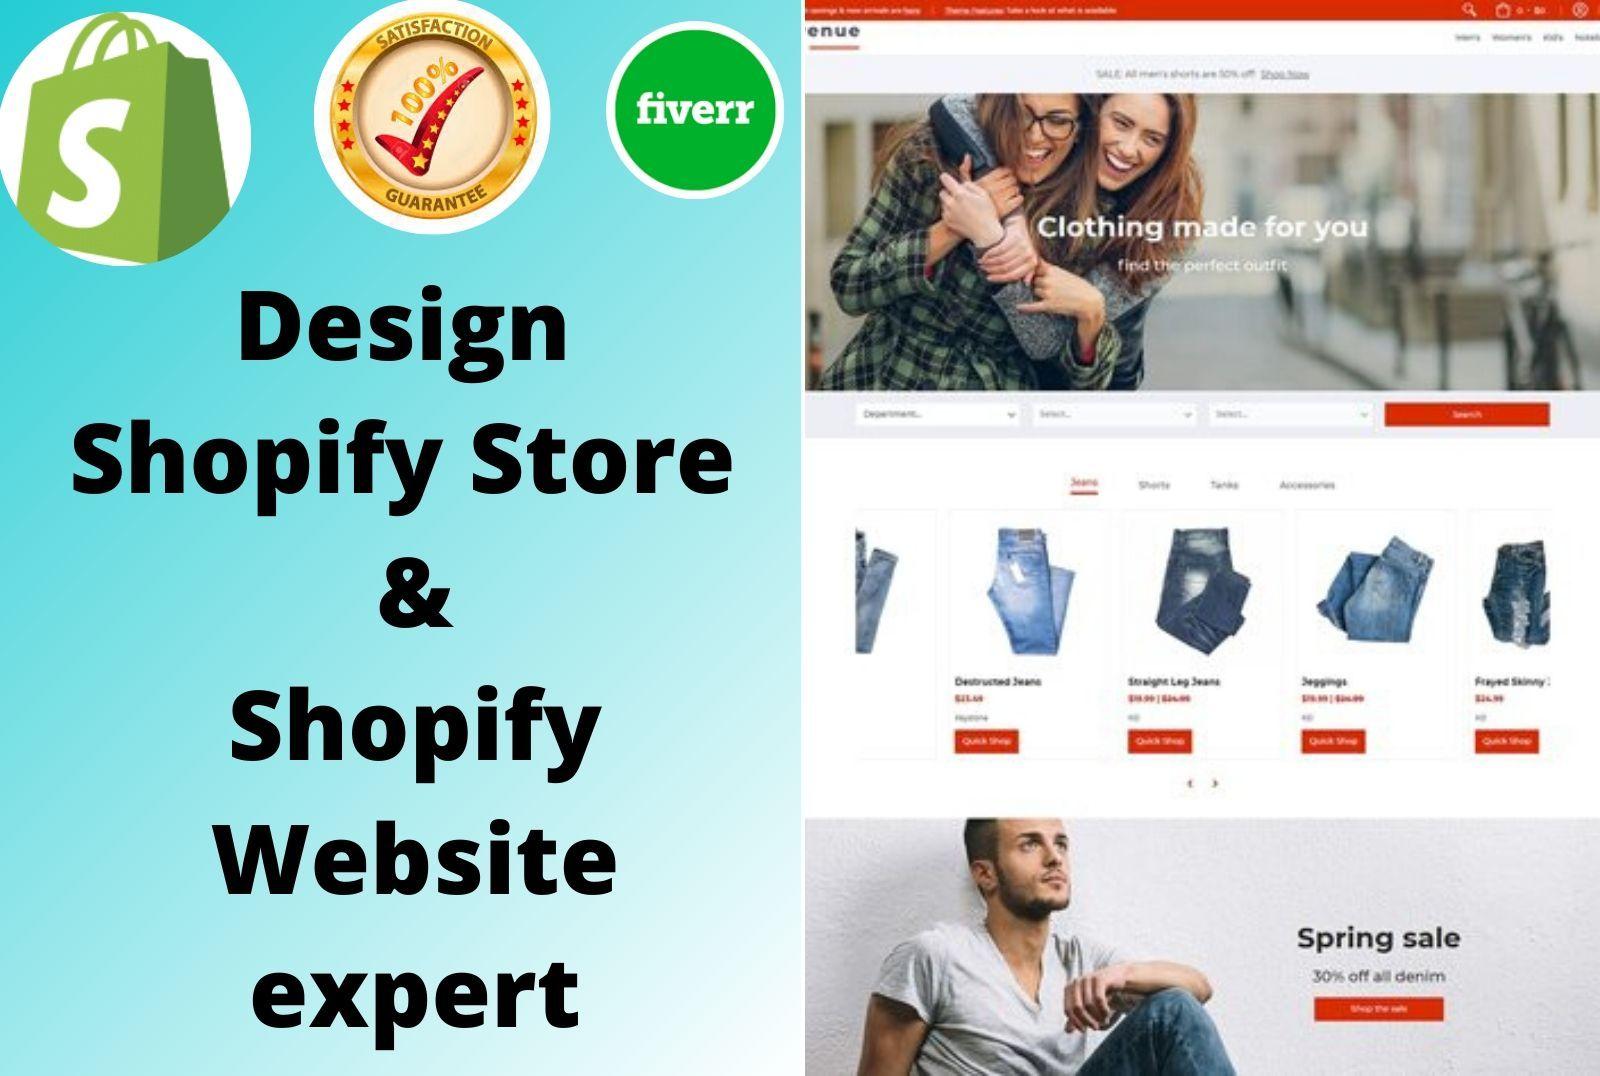 Hire A Freelance Developer For Programming Jobs Fiverr Shopify Website Fiverr Shopify Store